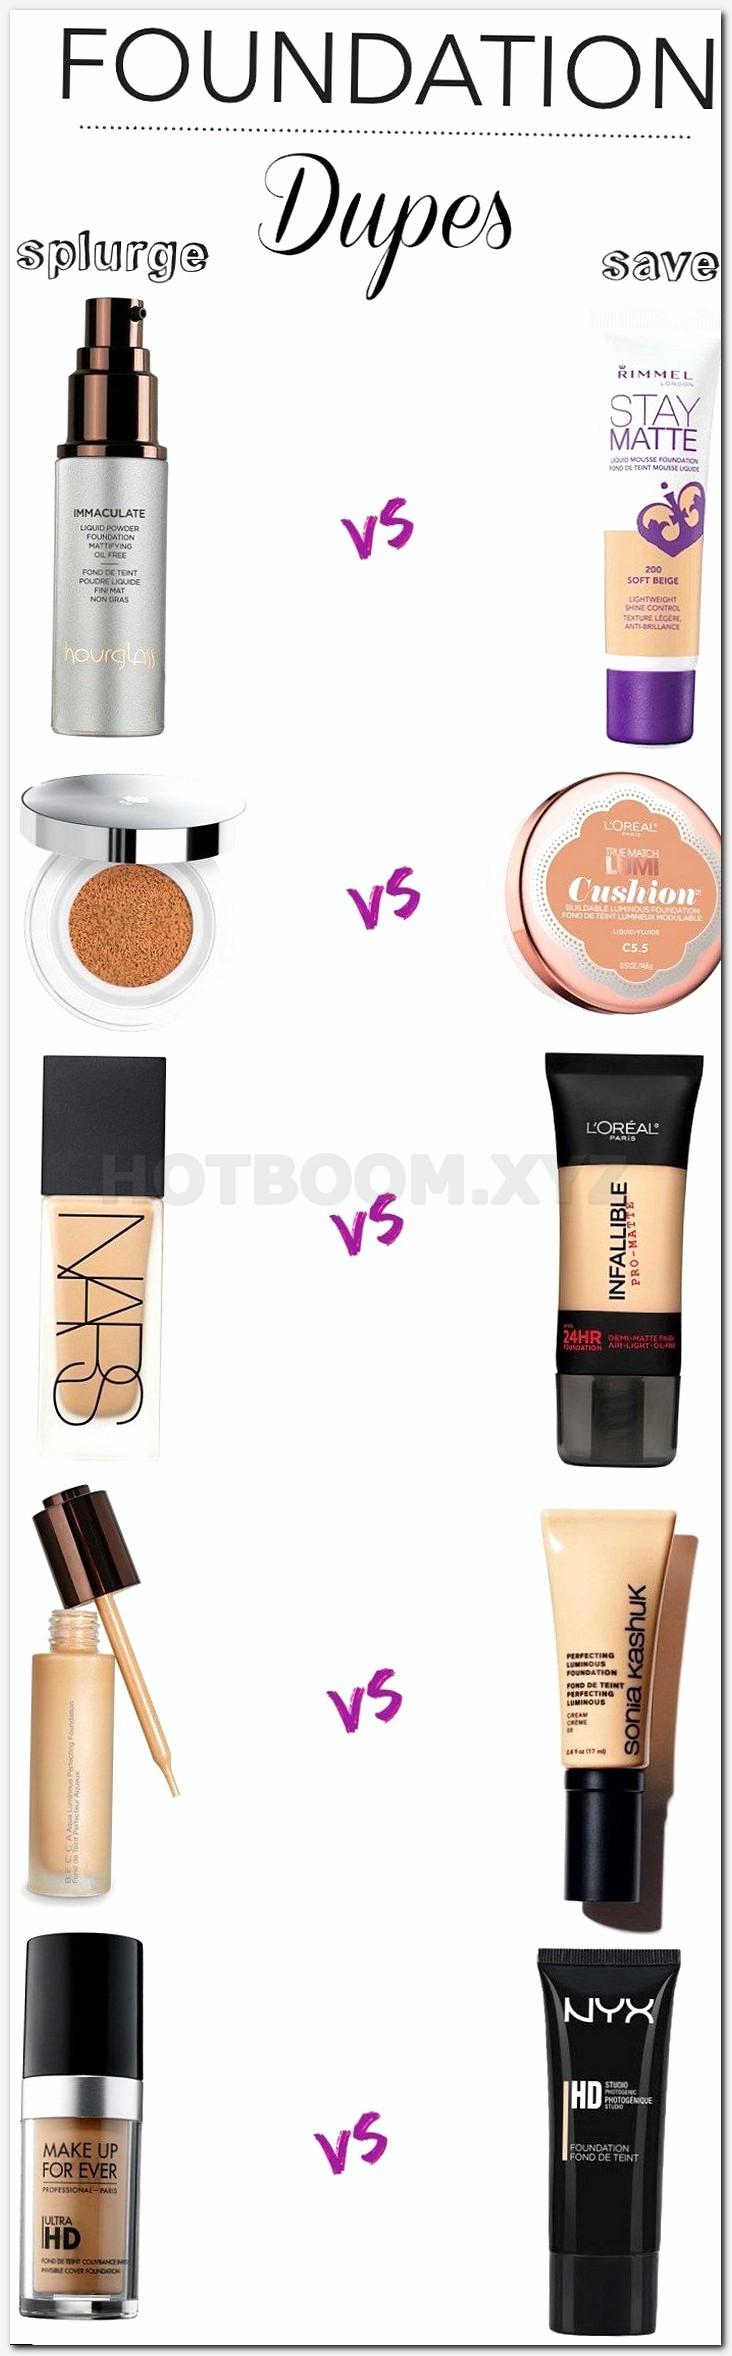 Meik Up Makeup Editor Online How To Put Proper Make Up Makeup